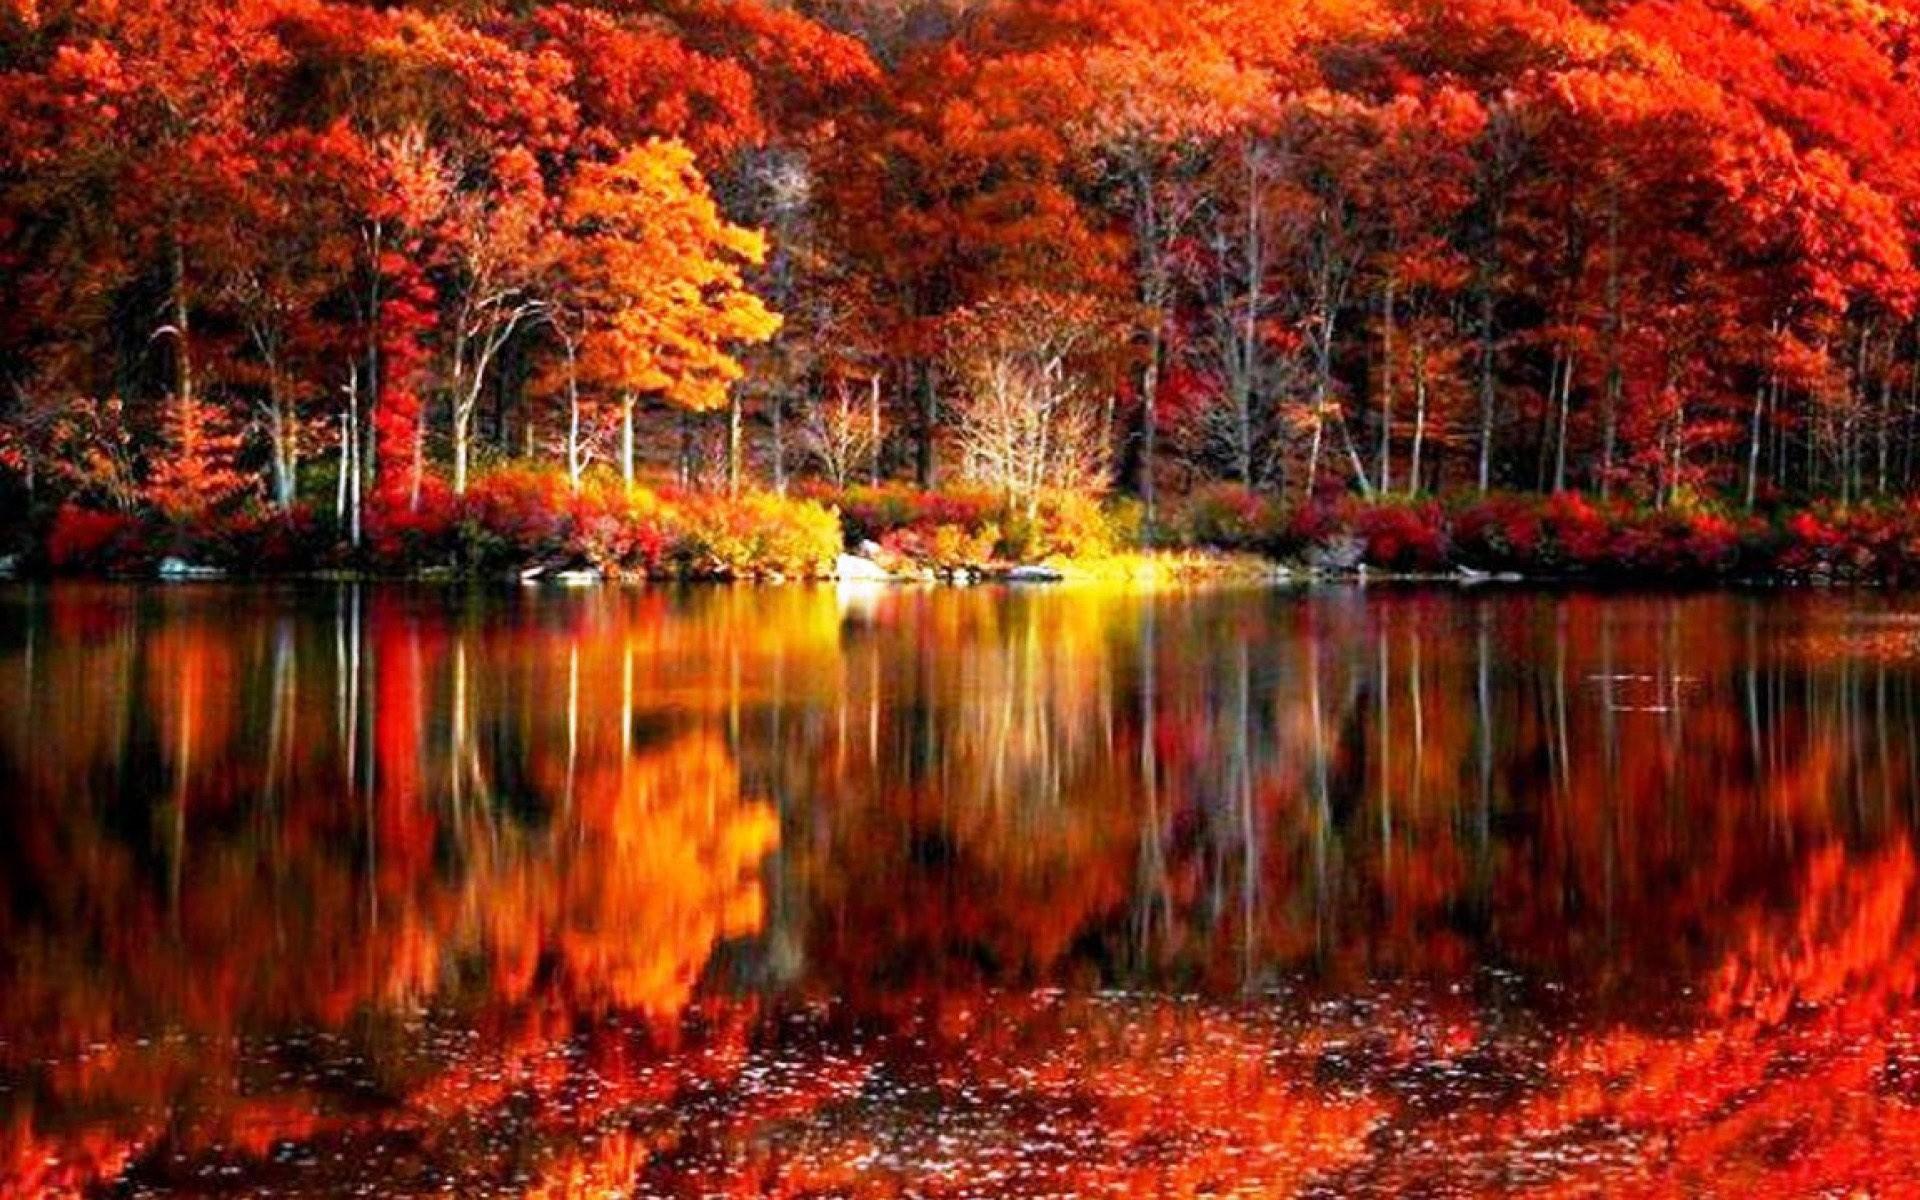 Free Computer Wallpaper Fall Leaves Desktop Wallpaper Autumn Leaves 65 Images